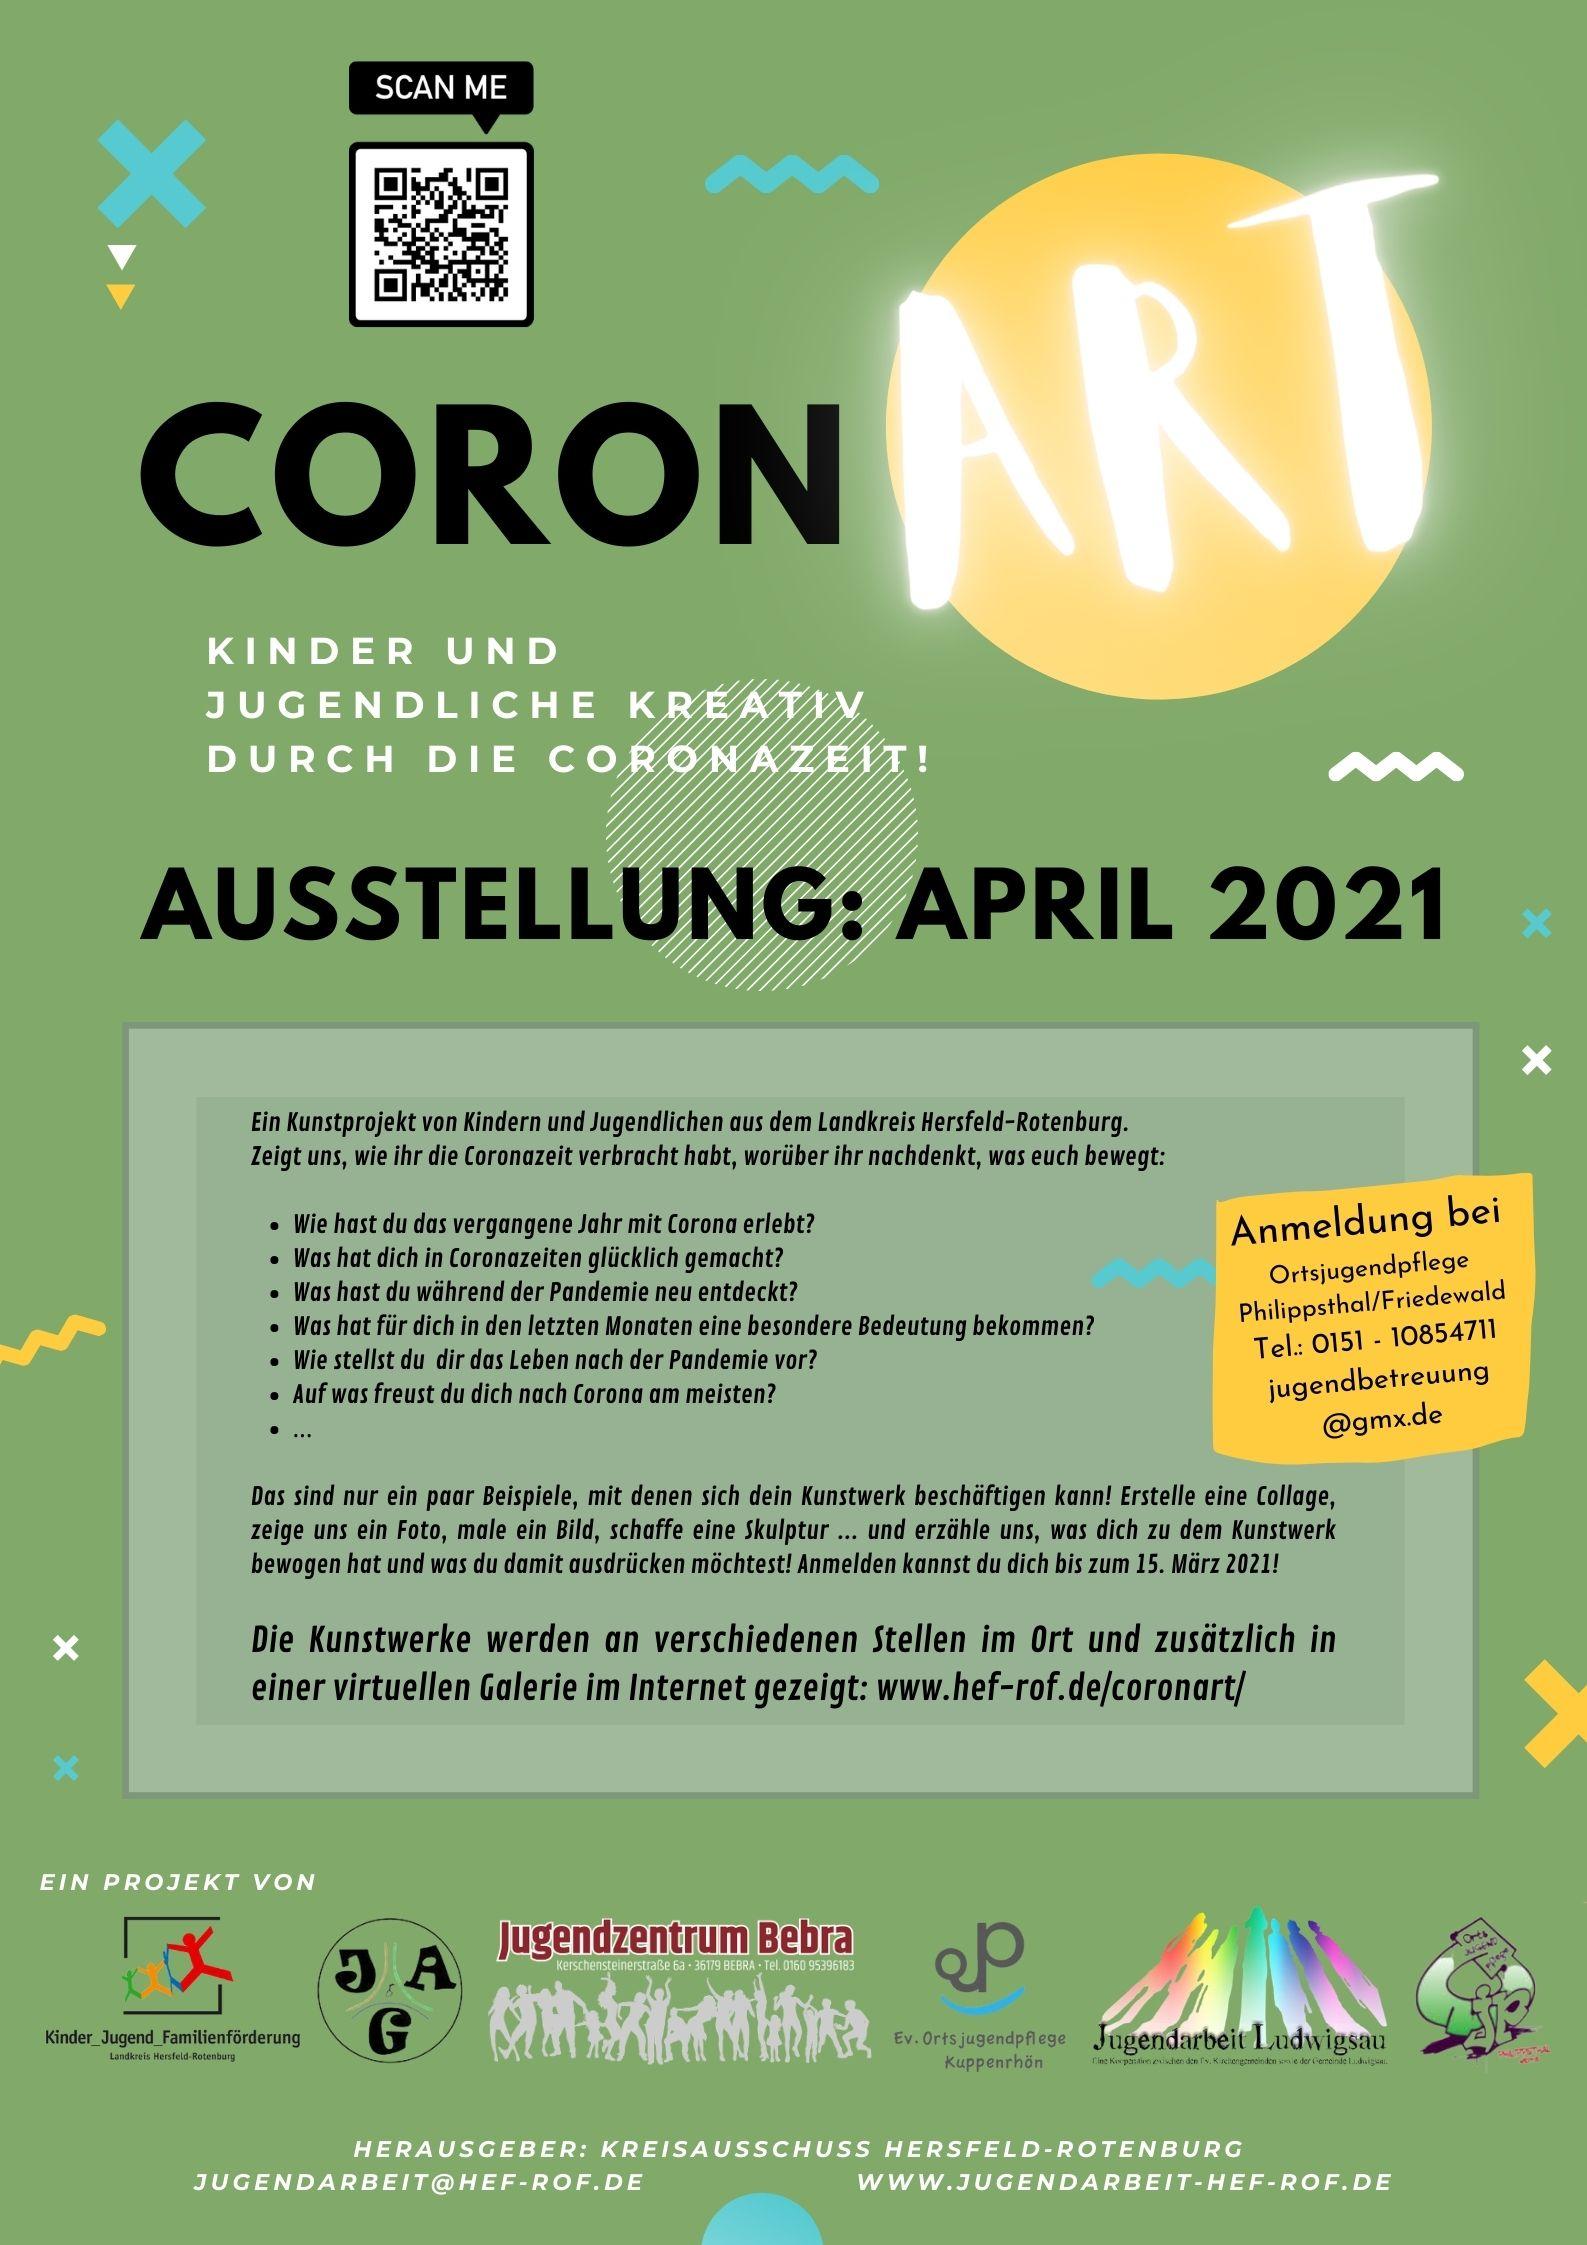 coronArt - Kunstrpojekt